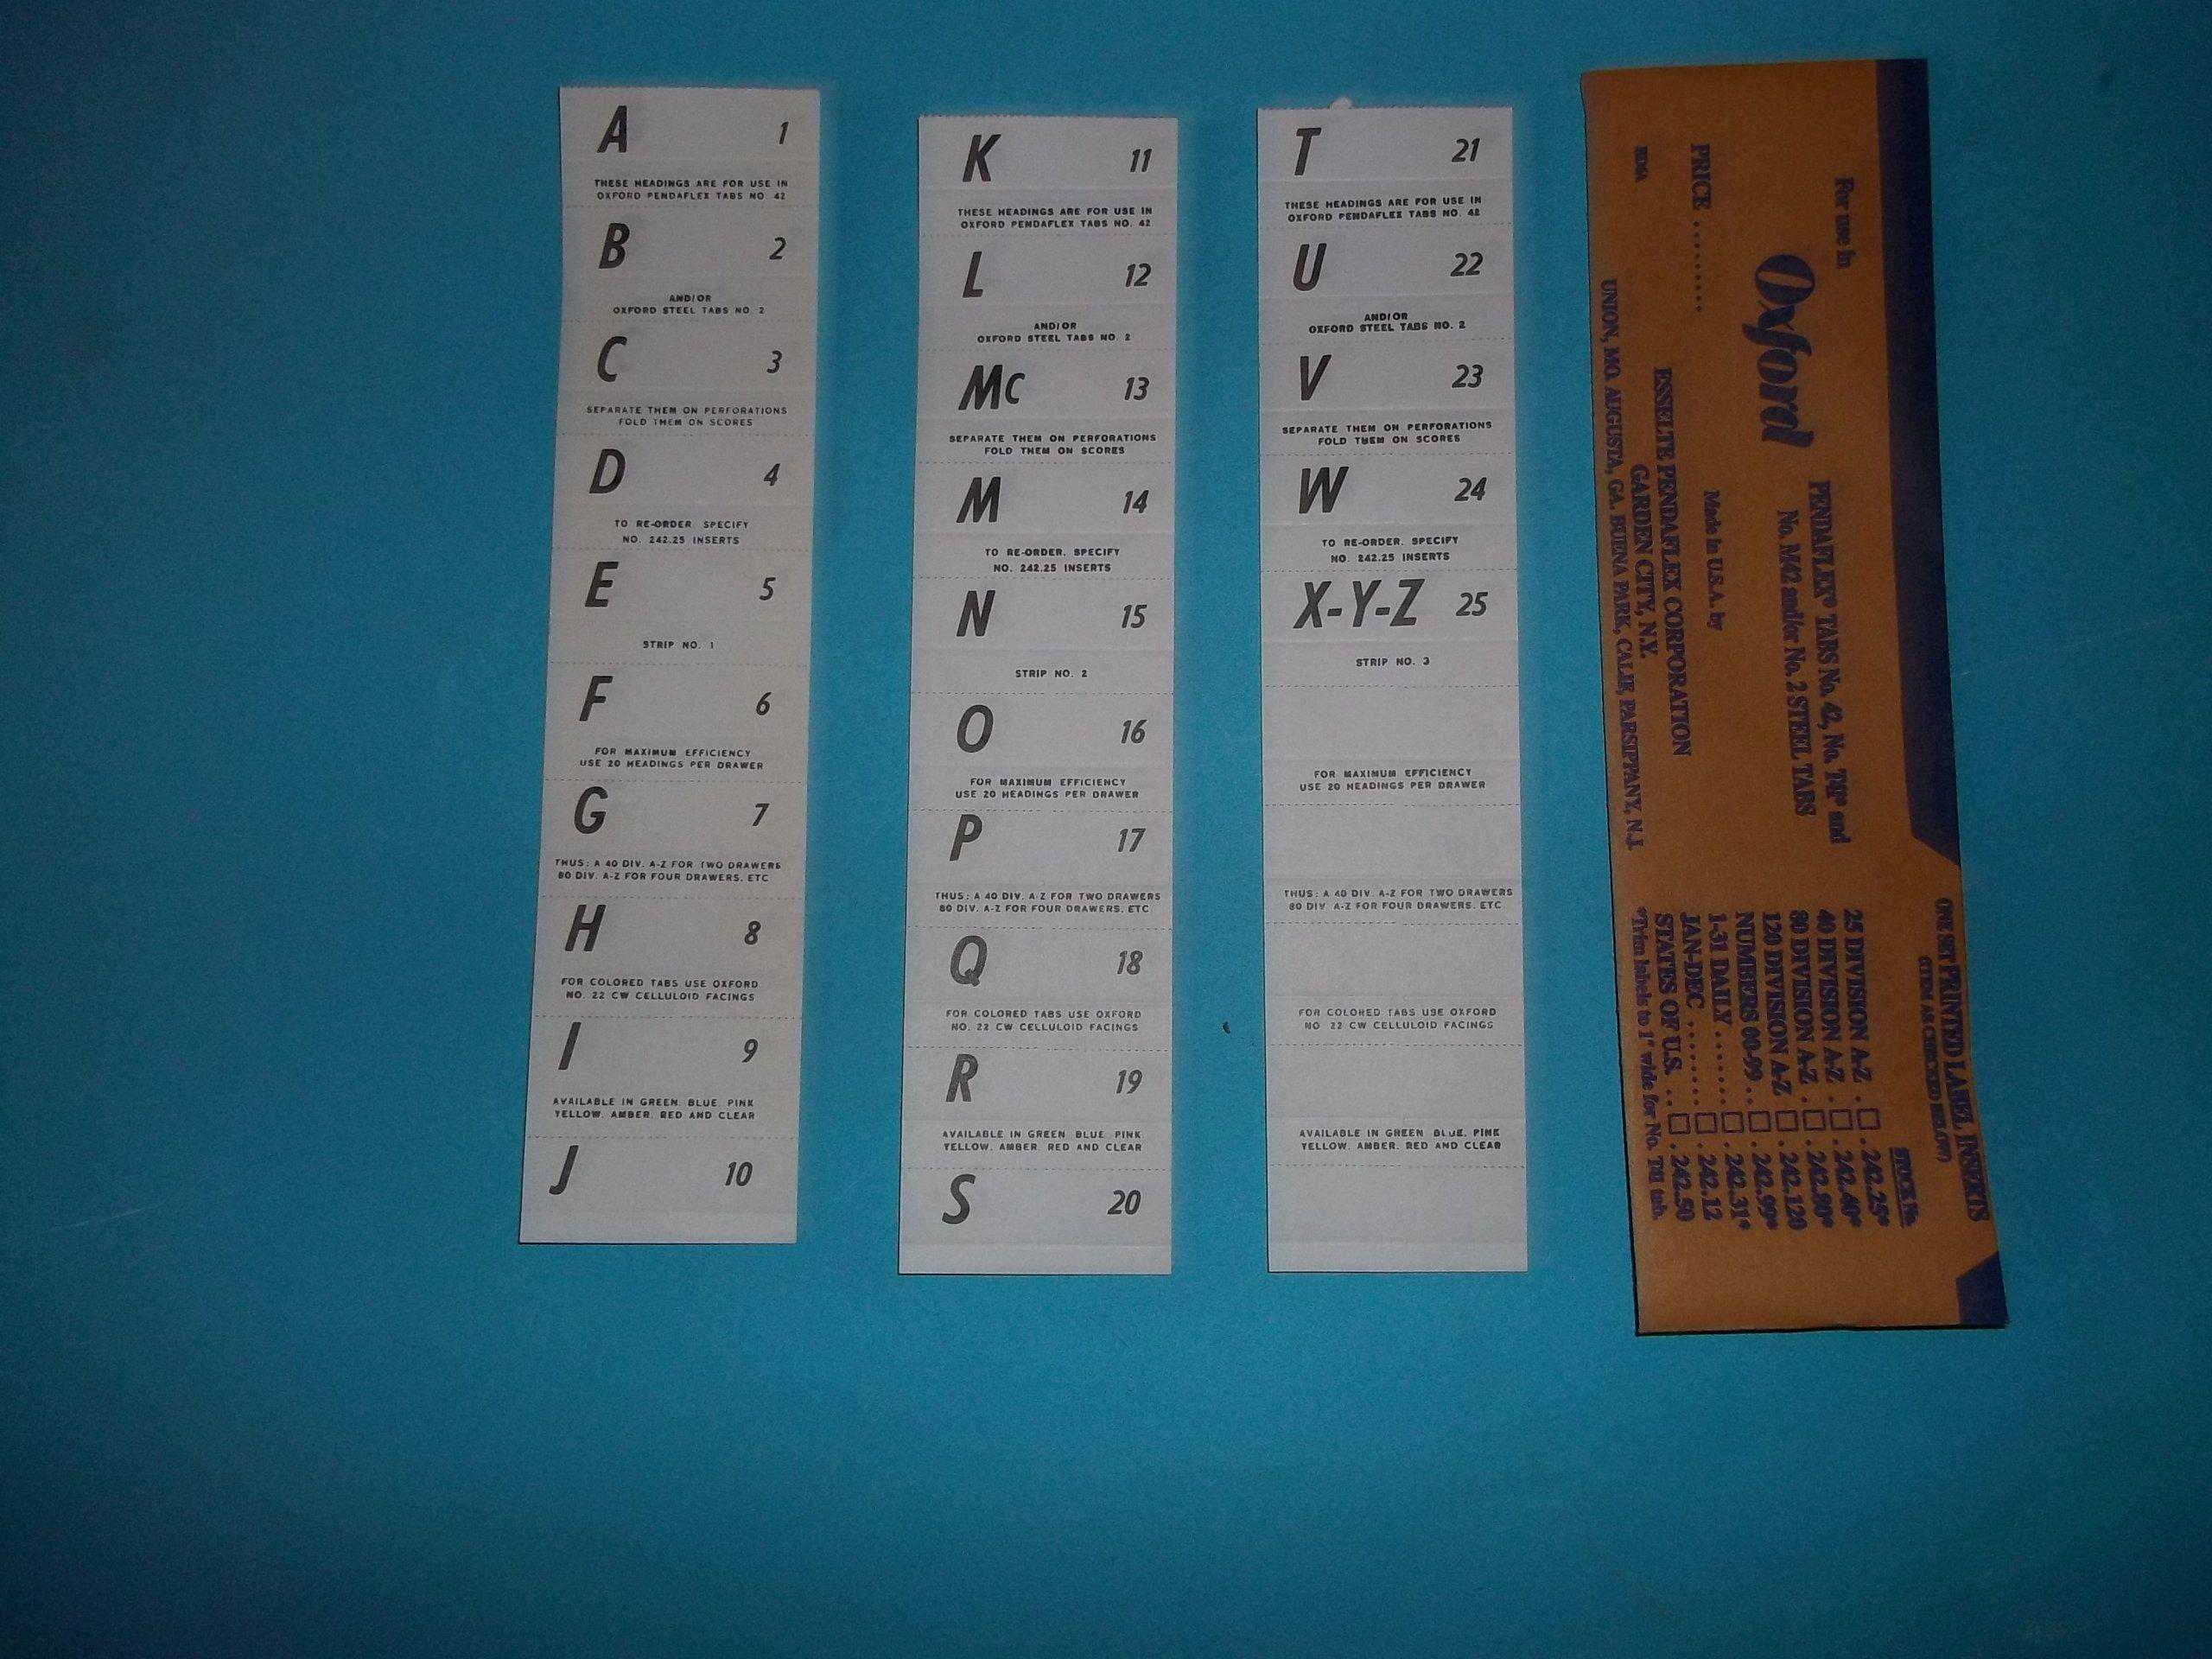 Oxford Pendaflex No 242 Label Inserts (Tab Inserts) Printed Sets A-Z 1-25 2'' x 9/16''